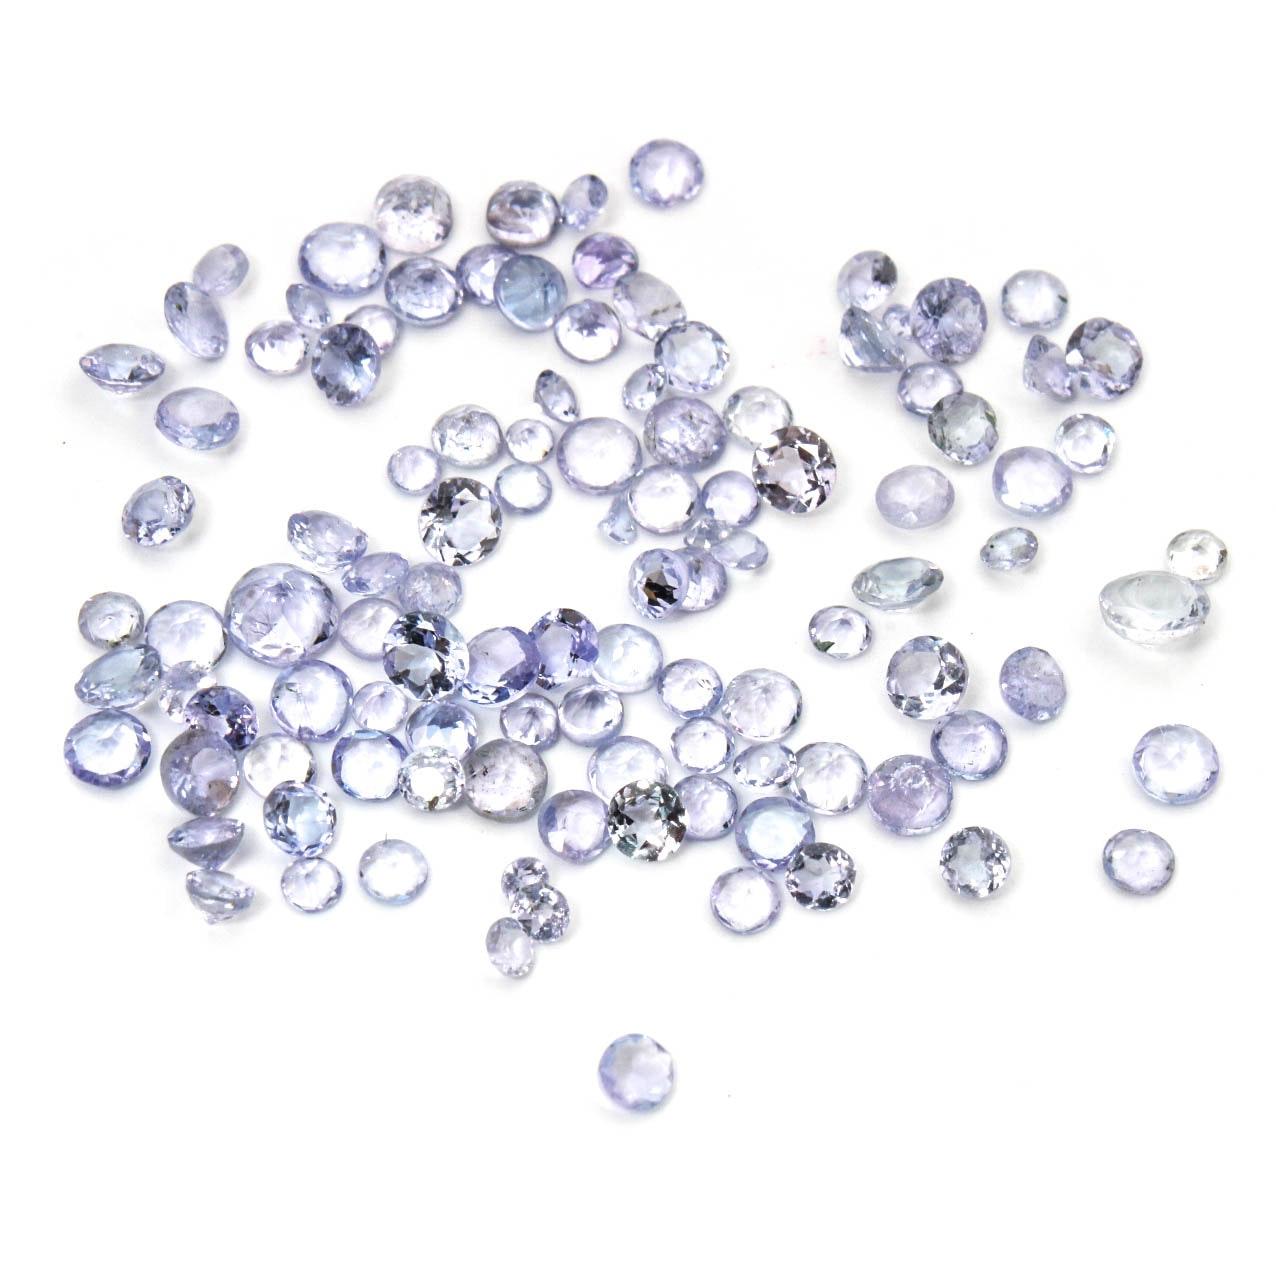 Loose Amethyst Gemstones